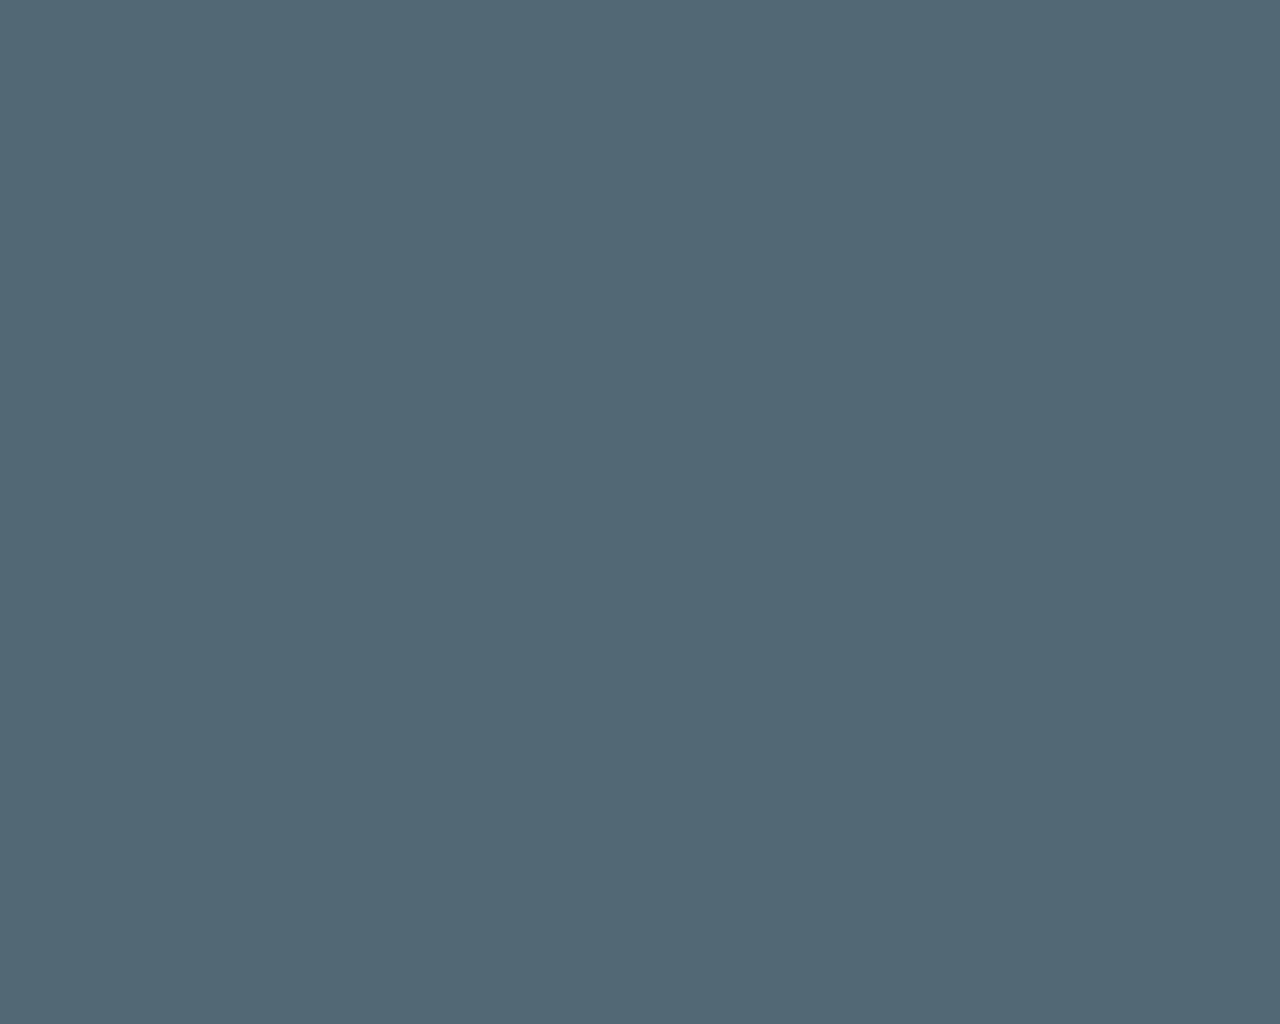 1280x1024 Cadet Solid Color Background